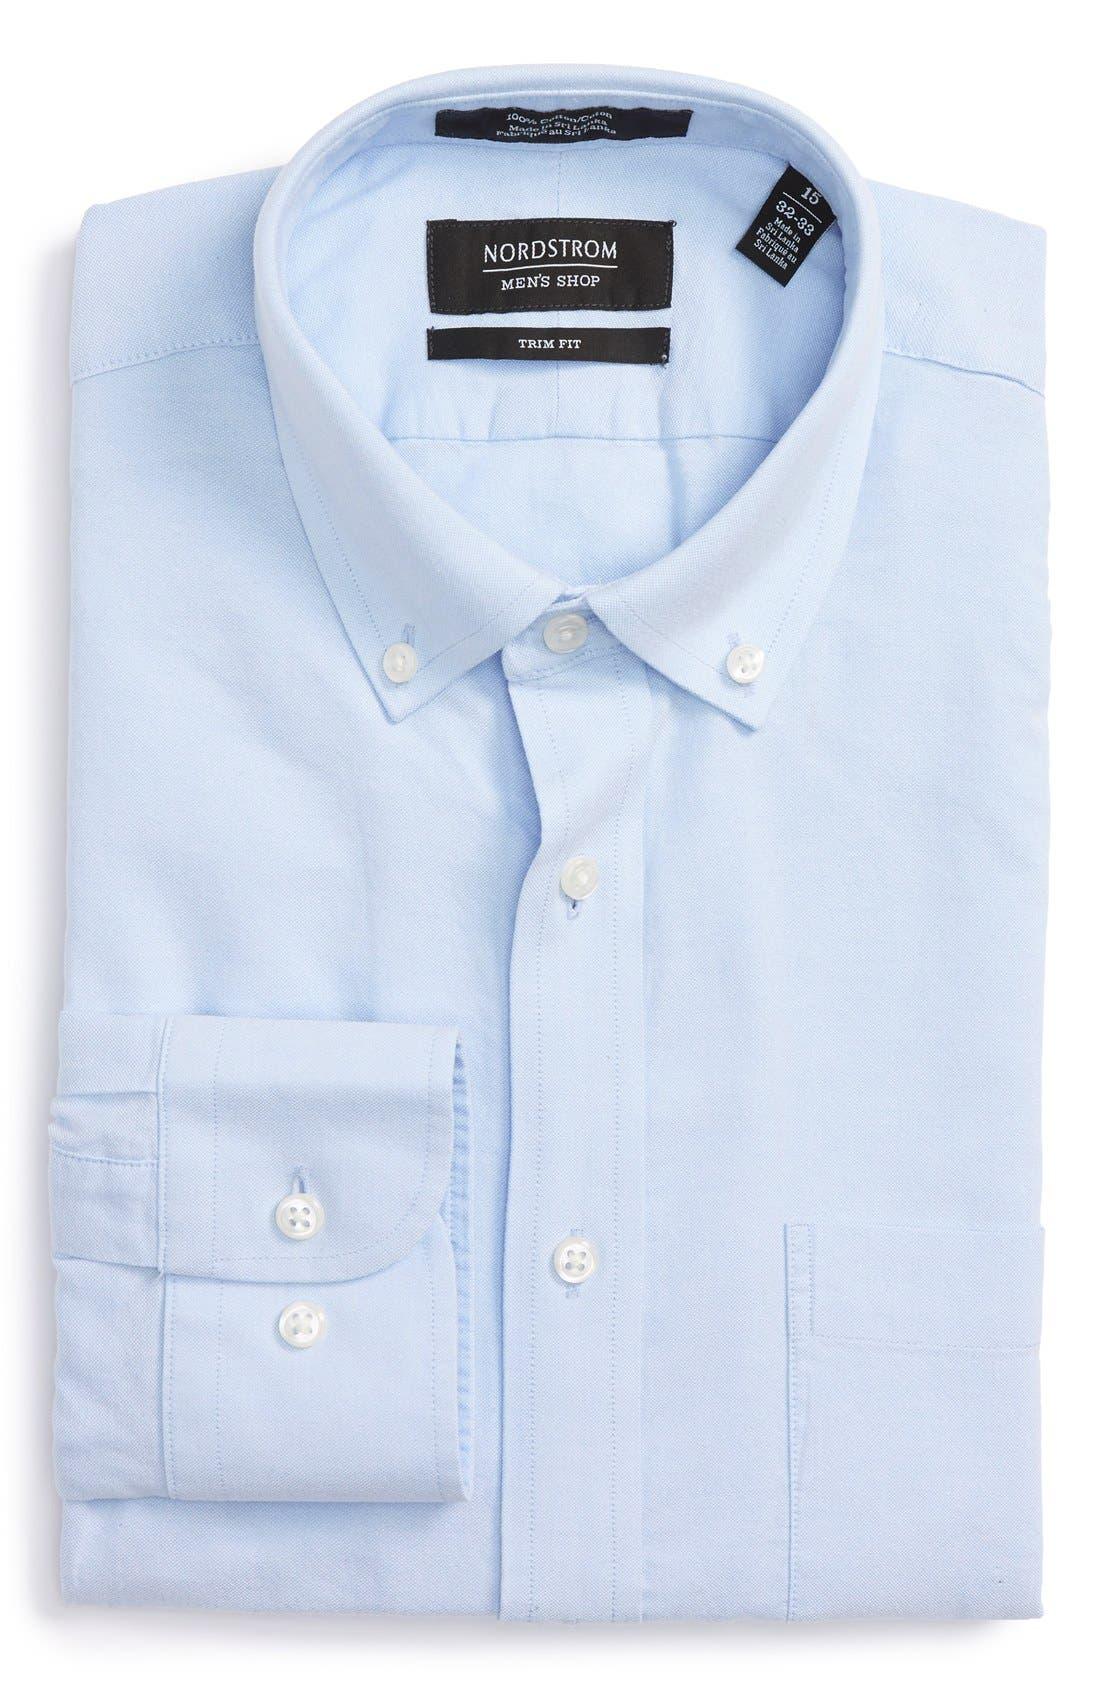 Main Image - Nordstrom Men's Shop Trim Fit Solid Oxford Dress Shirt